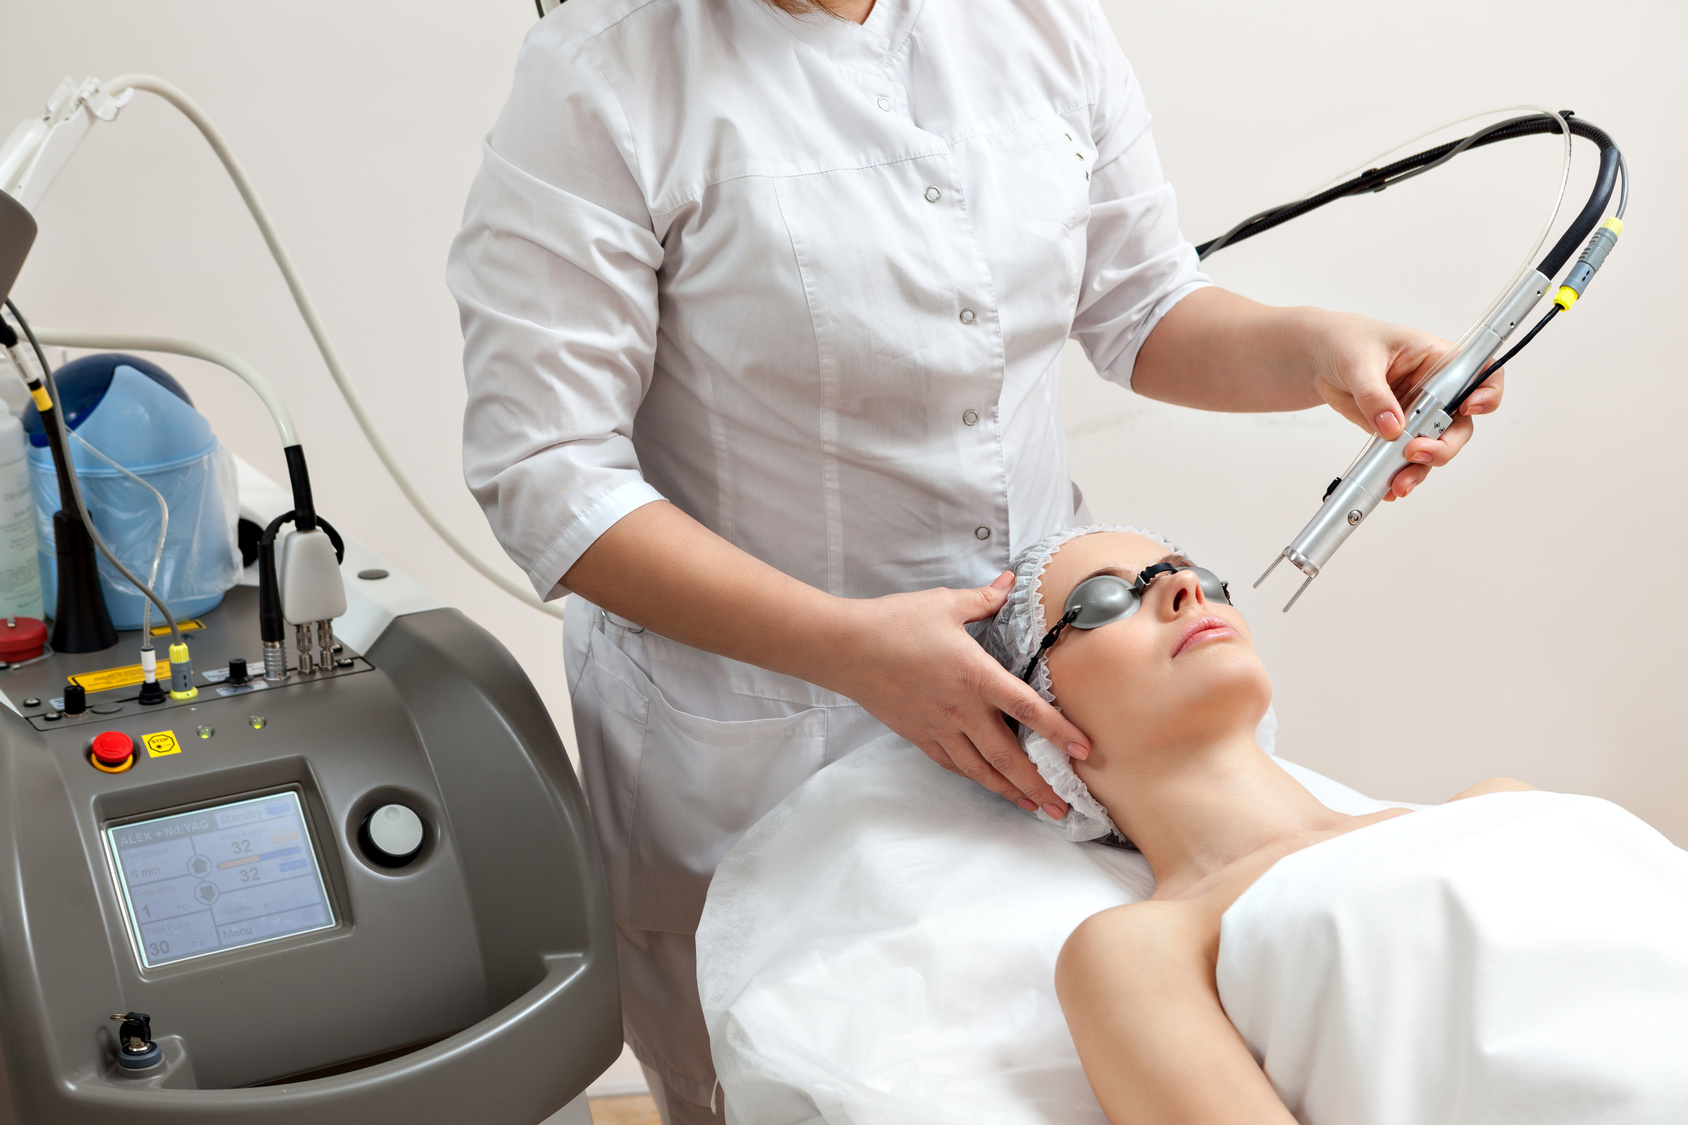 permanent hårborttagning skellefteå